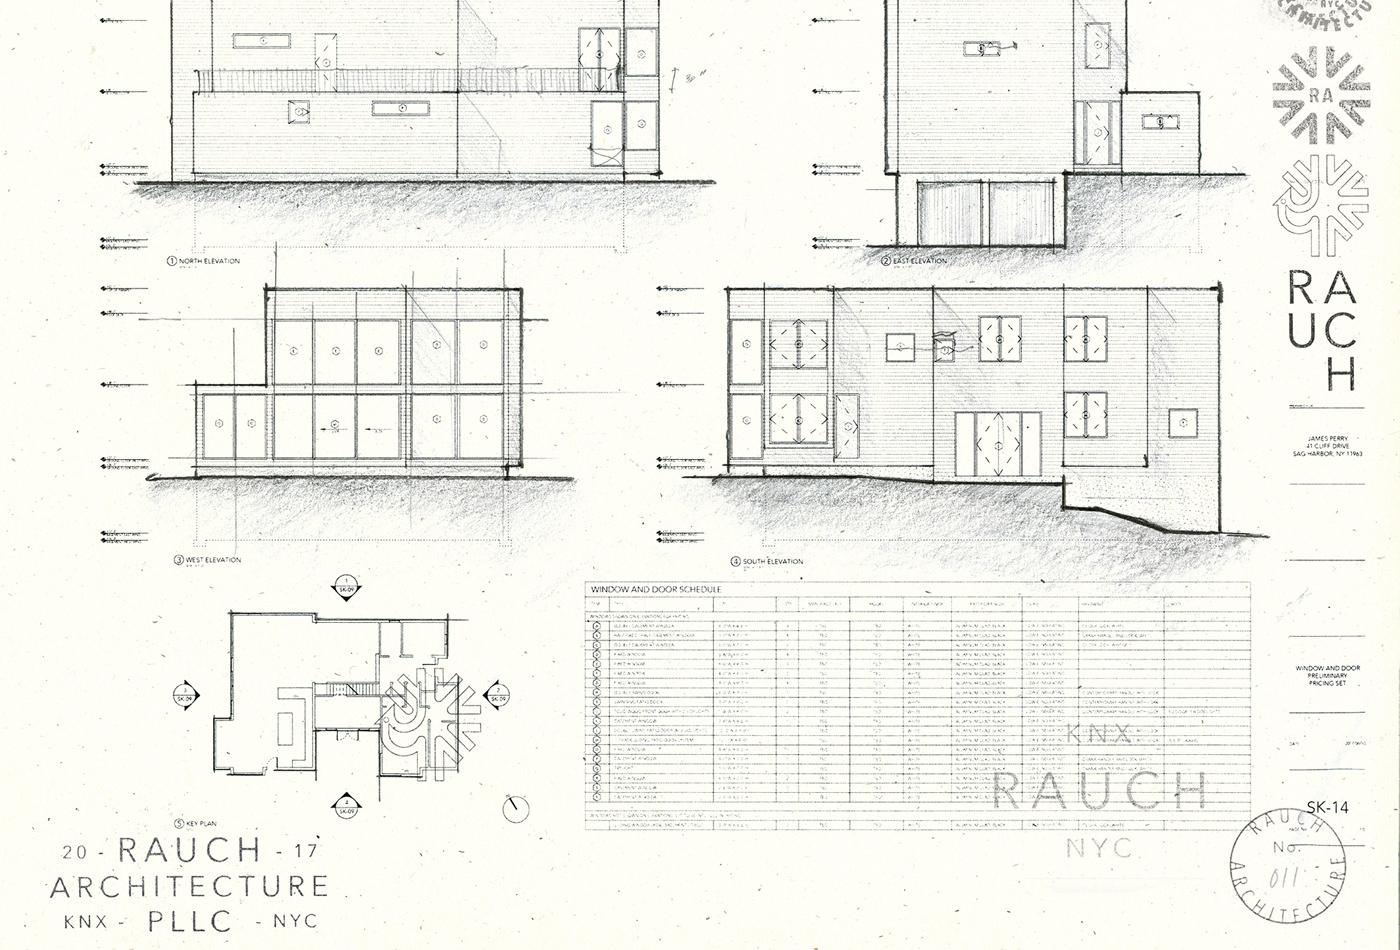 ra-rauch-architecture-matthew-rauch-architecture-pllc-nyc-brooklyn-knx-architect-ppx-modernism-passengerpigeonx-vacaliebres-marks-schematic-midcentury-nkoxville